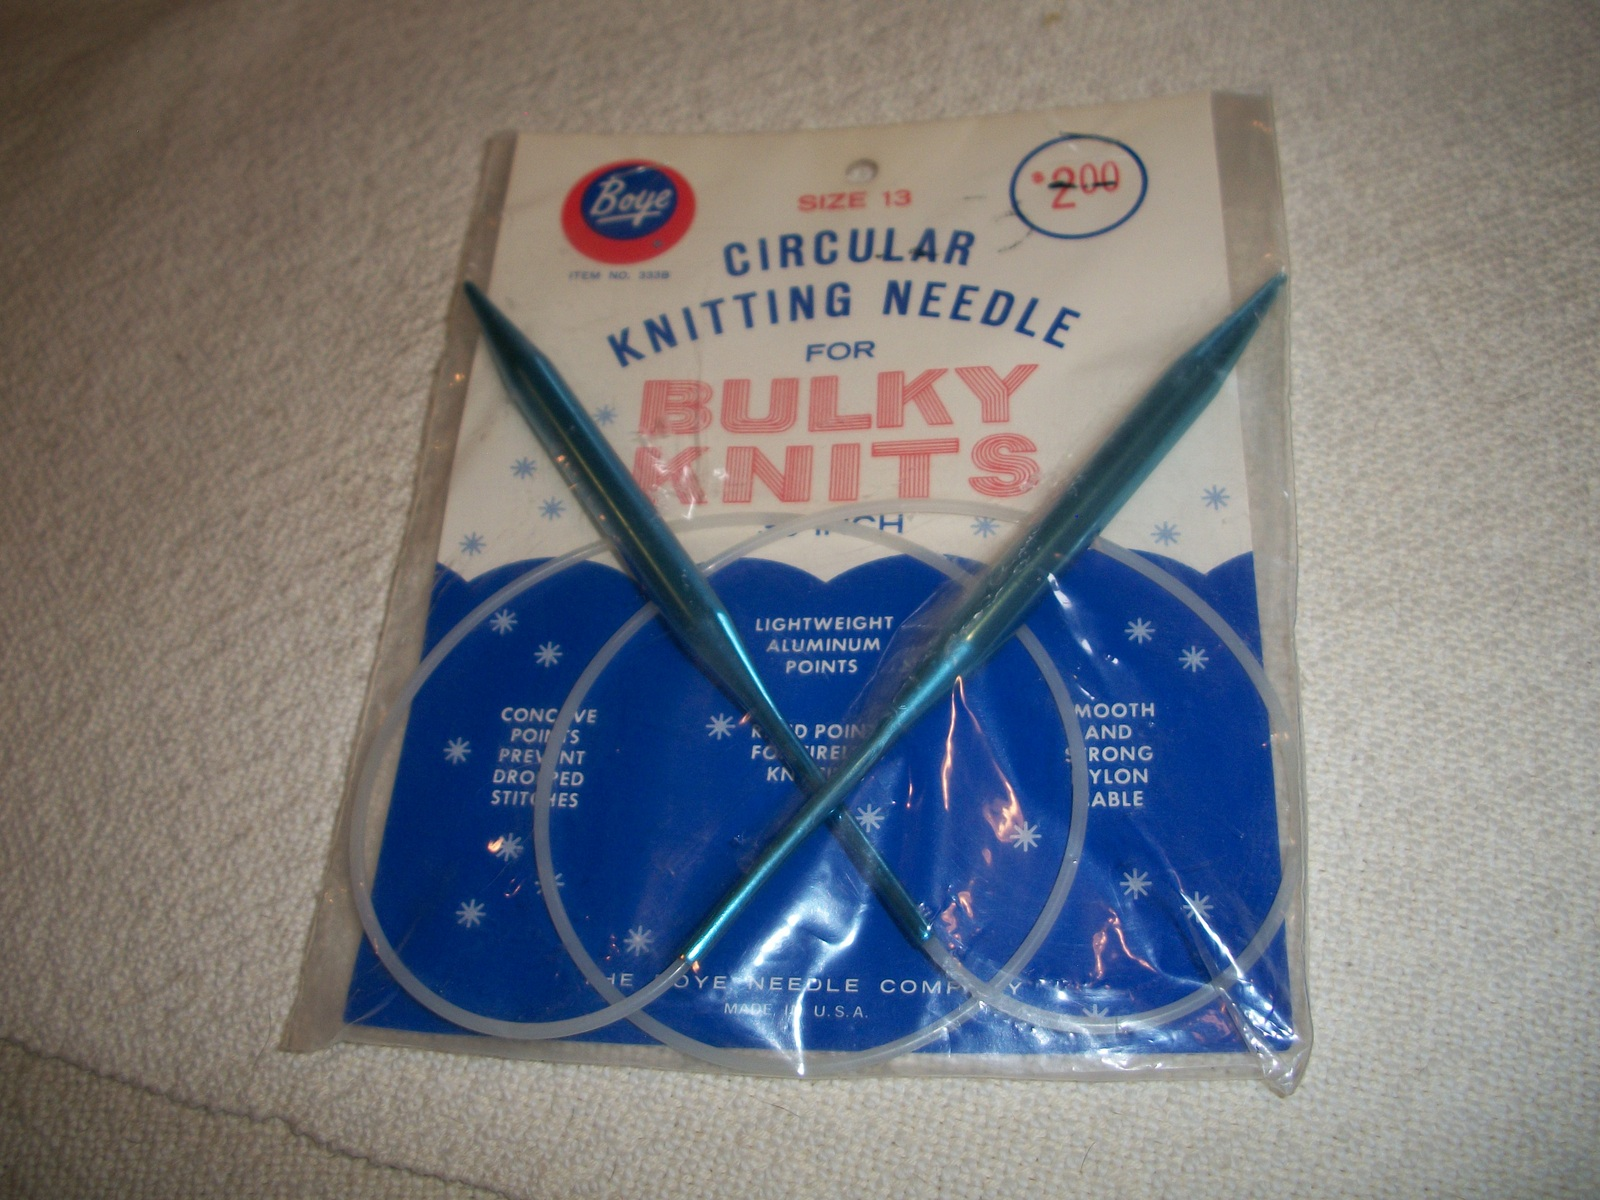 Circular Knitting Needles Size 13 - $5.00